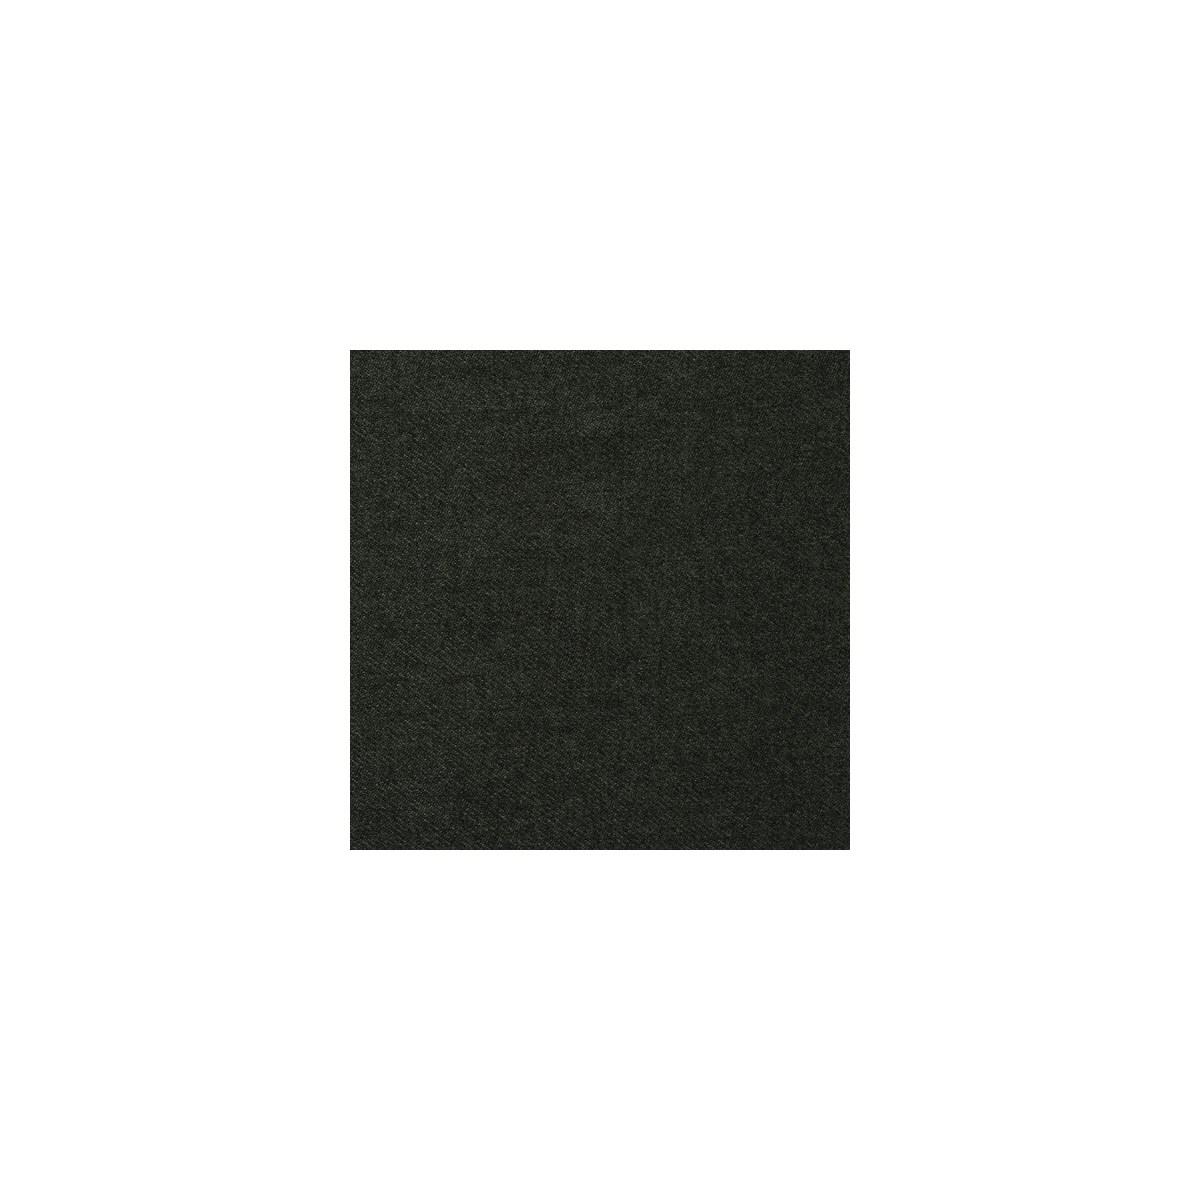 Burgess - Black - Fabric By the Yard